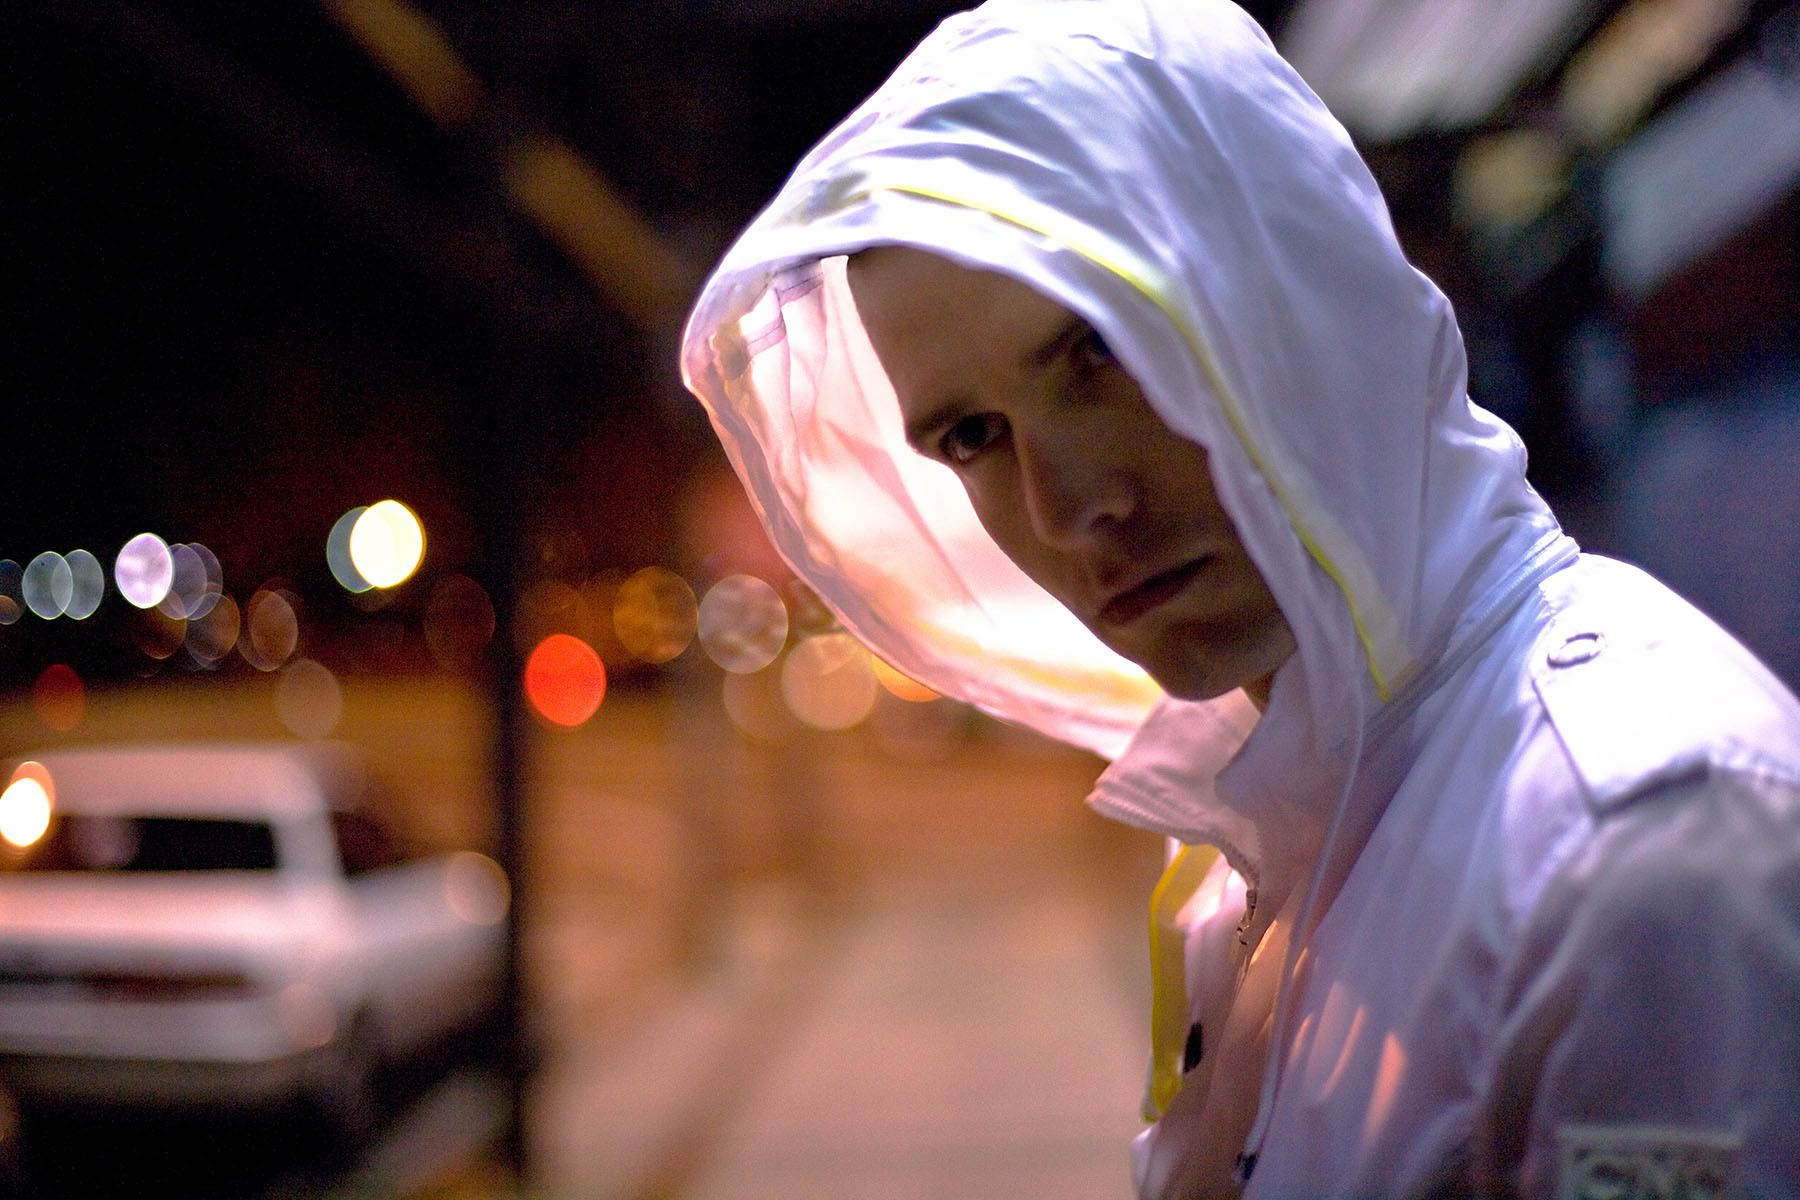 Model: Brad Allen